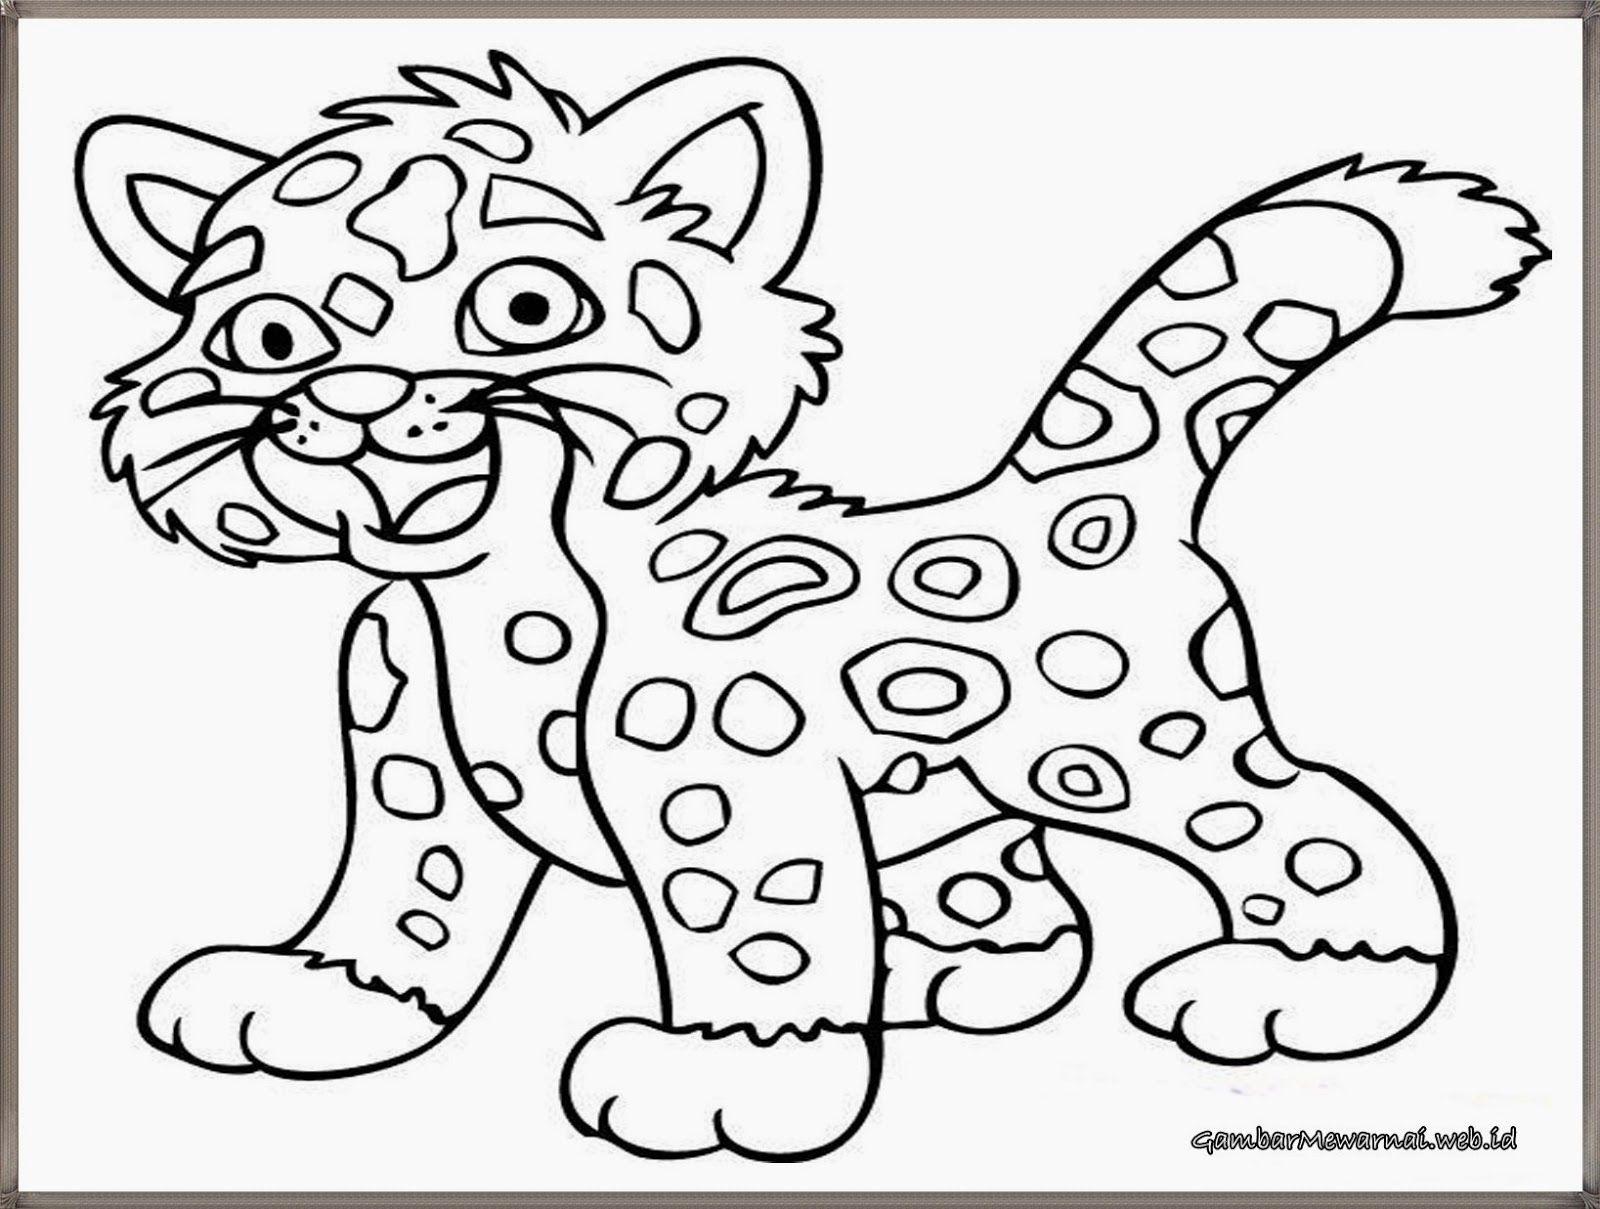 Gambar Mewarnai Anak Harimau Lucu Gambar Mewarnai Pinterest